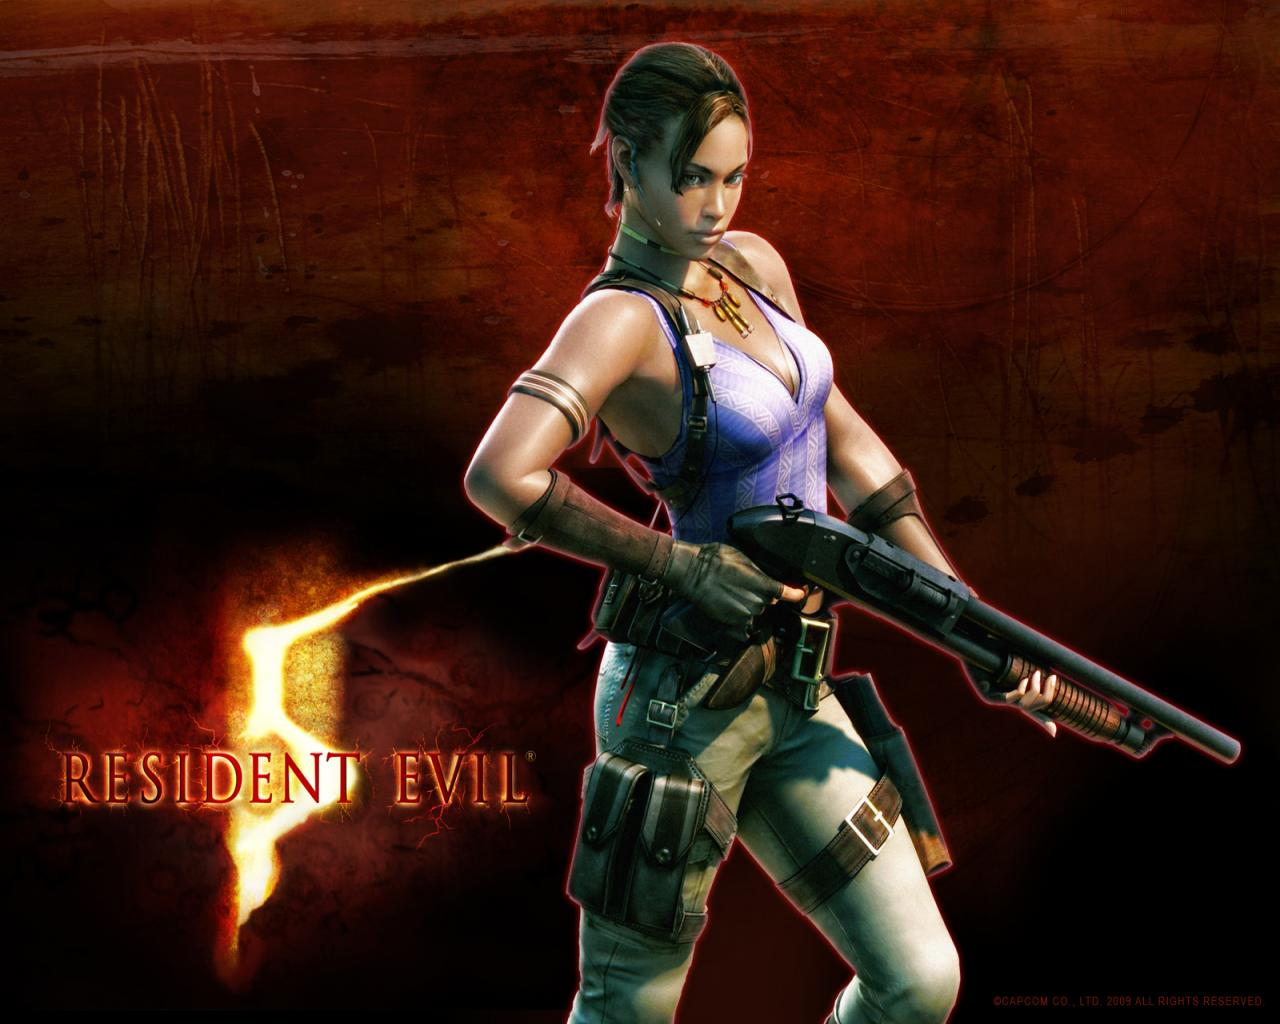 Resident evil nude image pron videos